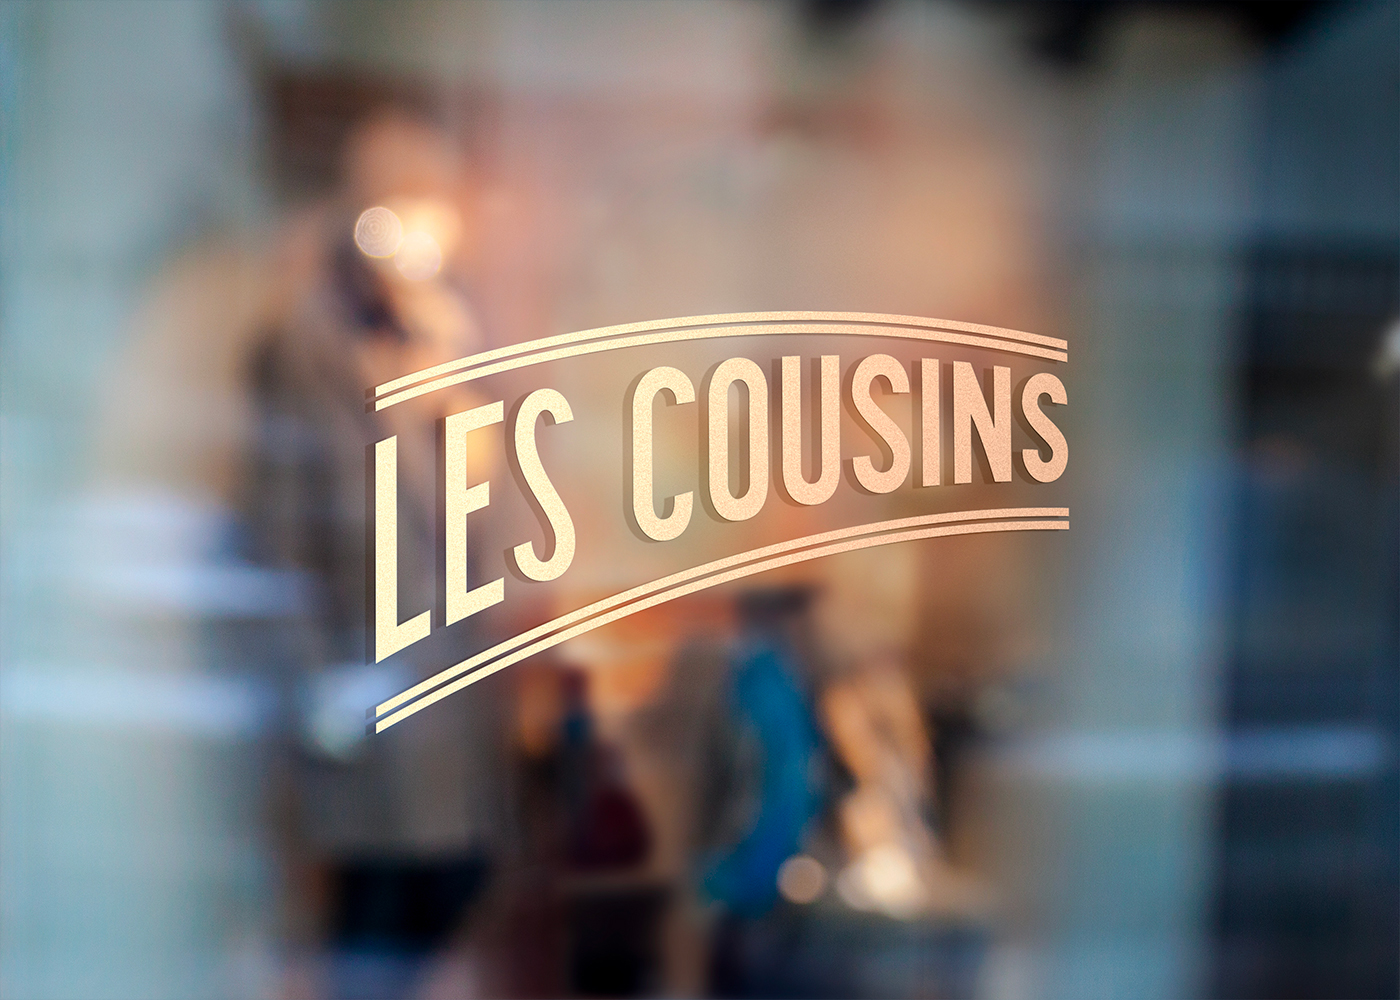 Les Cousins logo vitrine - Mathieu Dupuis freelance